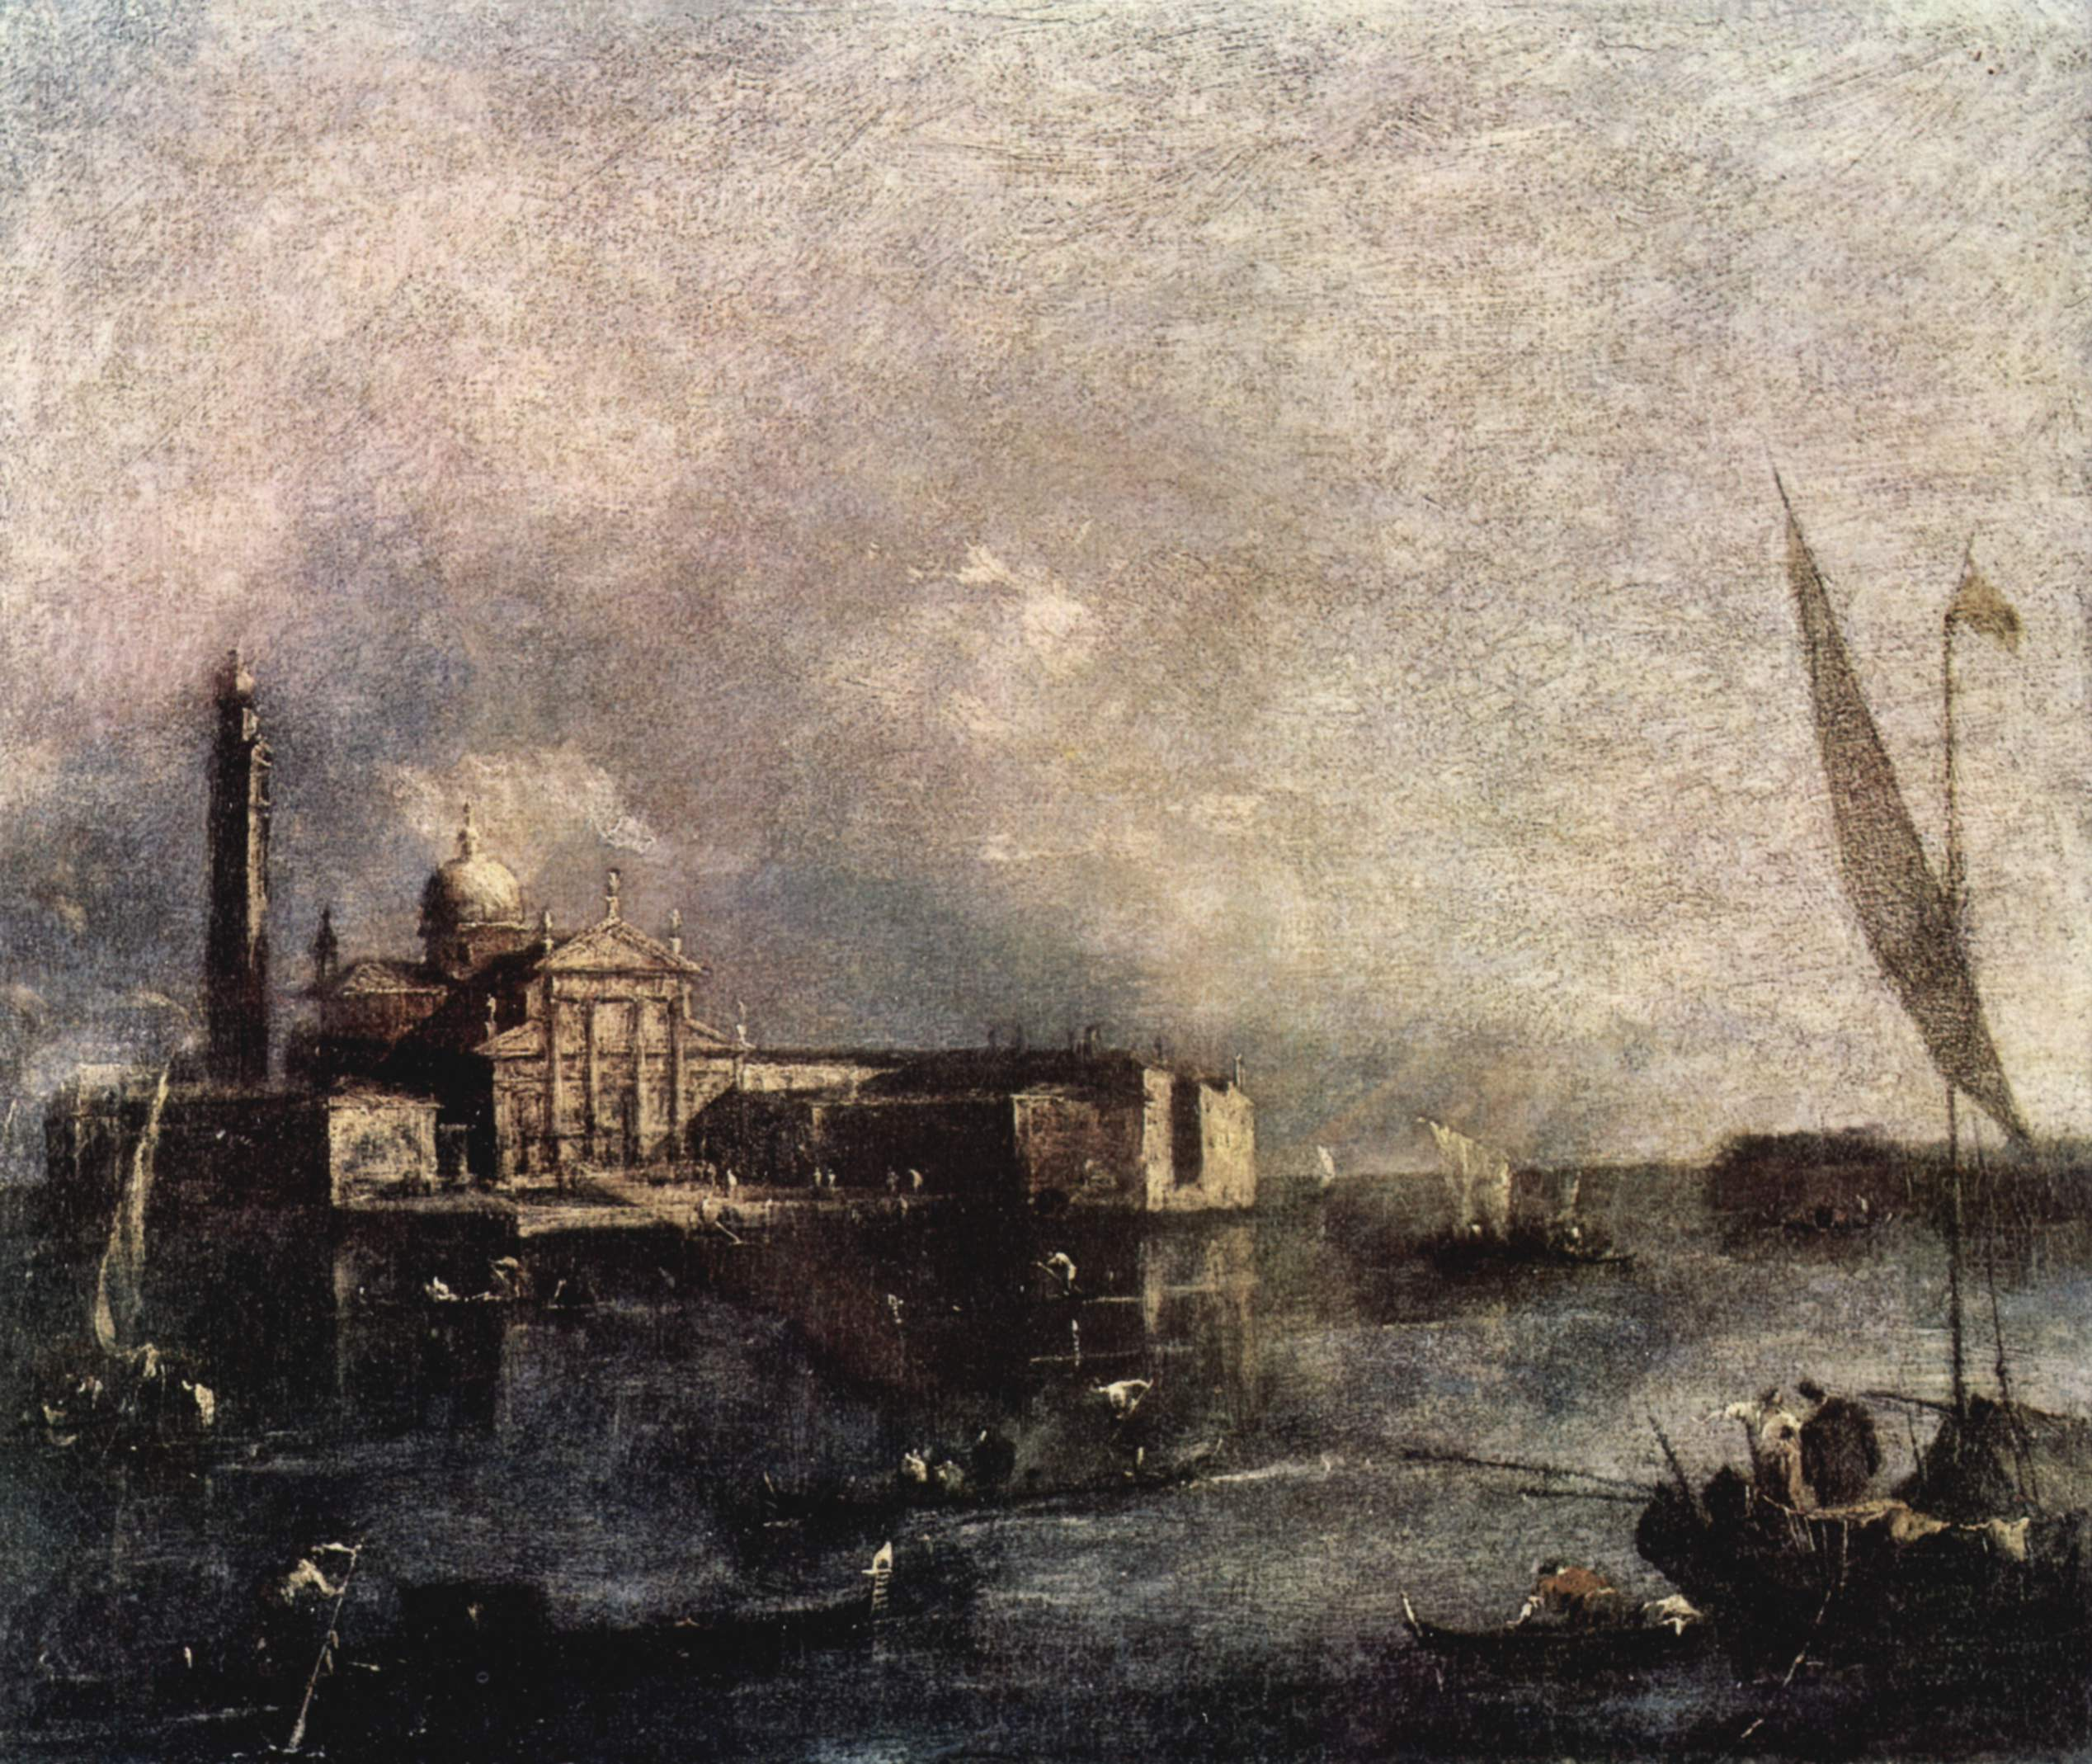 Francesco Guardi, L'isola di San Giorgio